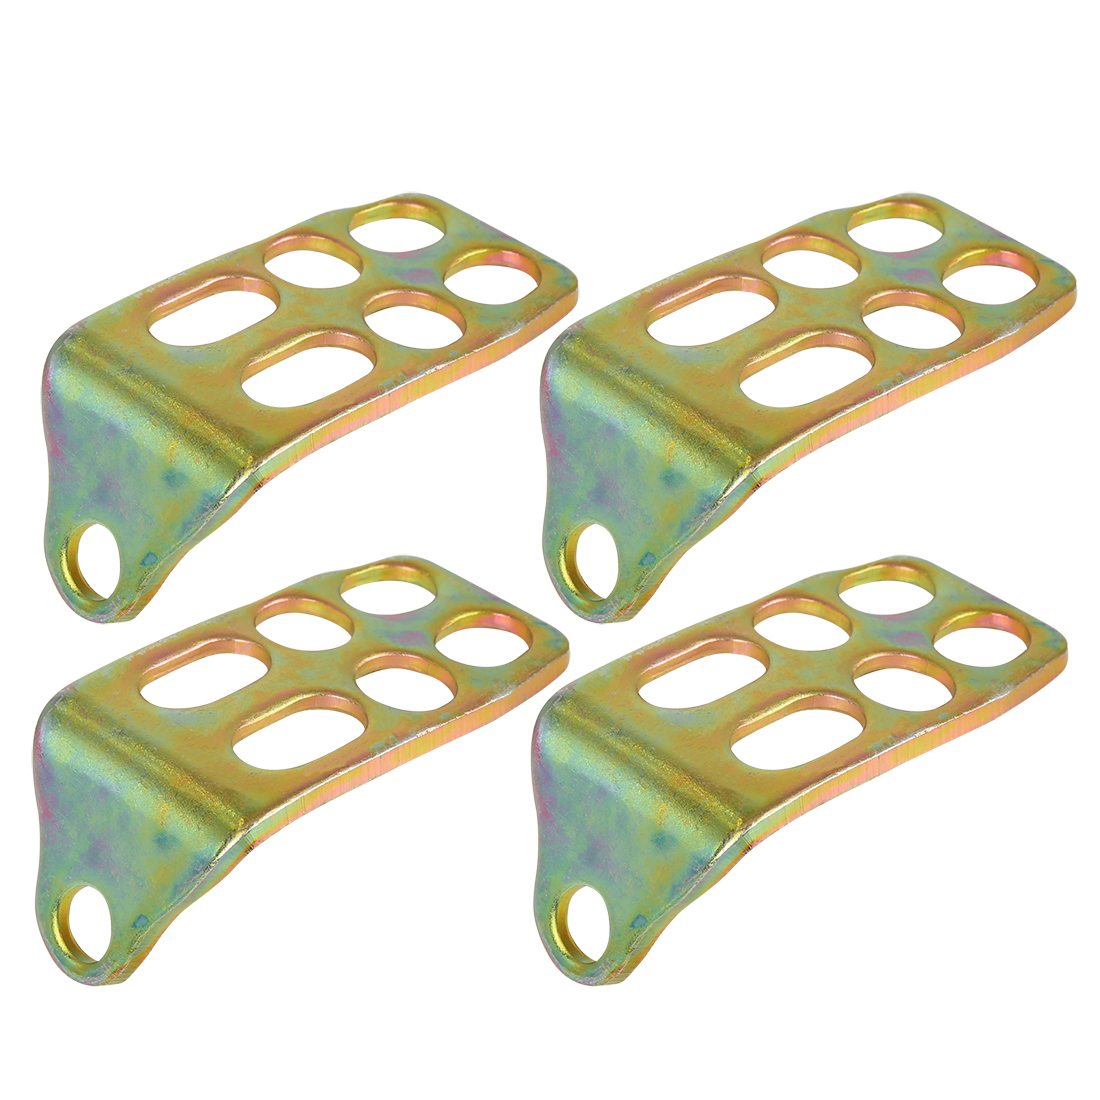 2 Pair Foot Pegs Plate Foot Board Footrest Foot Pedal Metal for Motorcycle